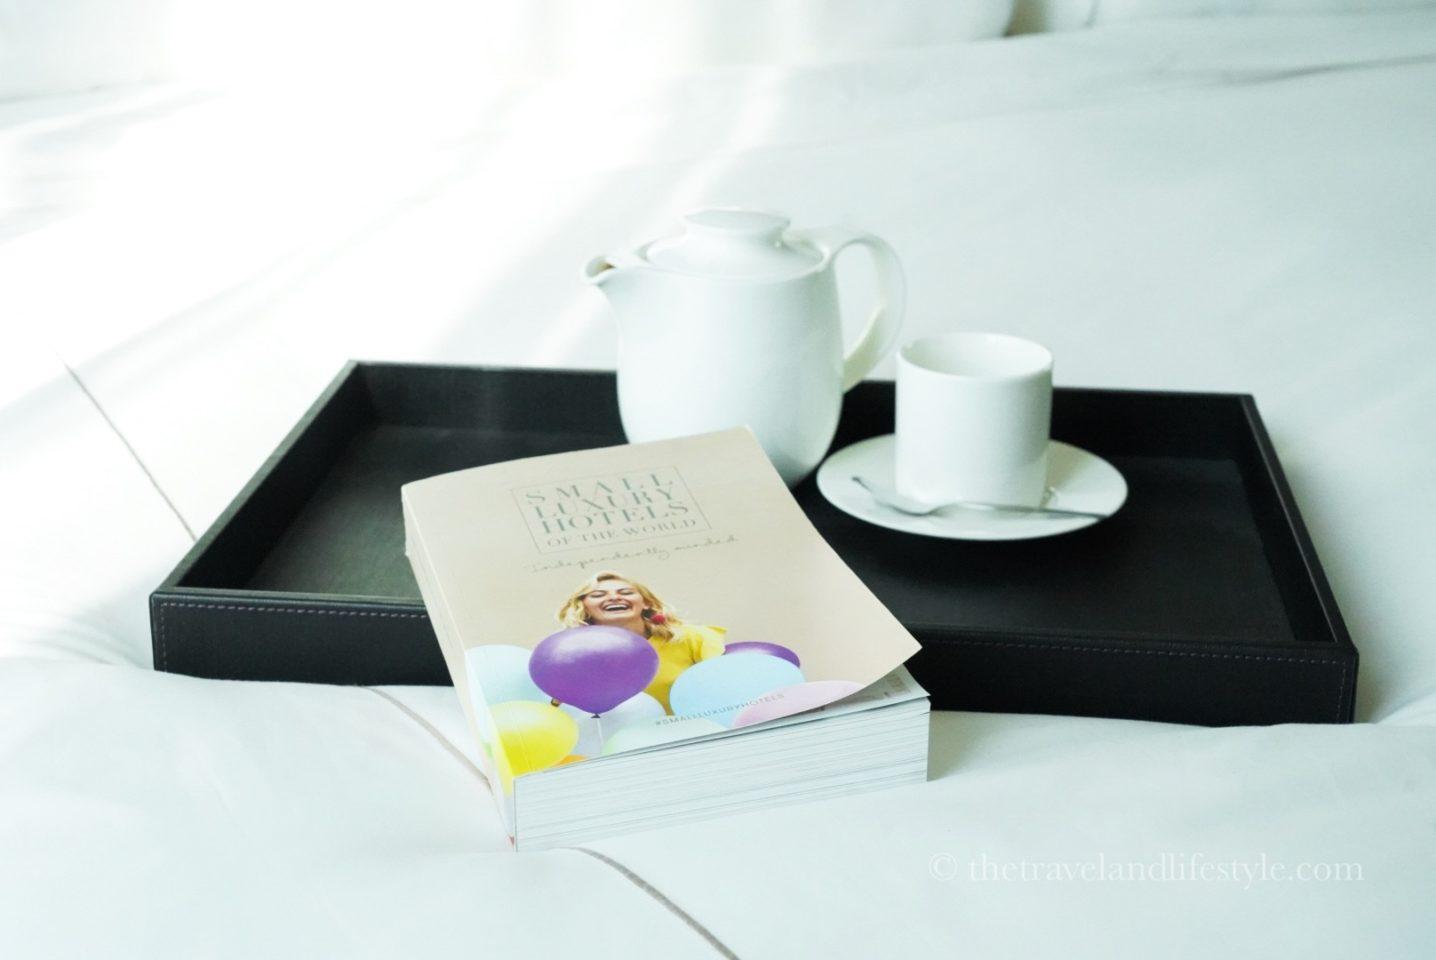 dsc08582 - akyra Thonglor Bangkok -  バンコクのラグジュアリーデザイナーズホテル